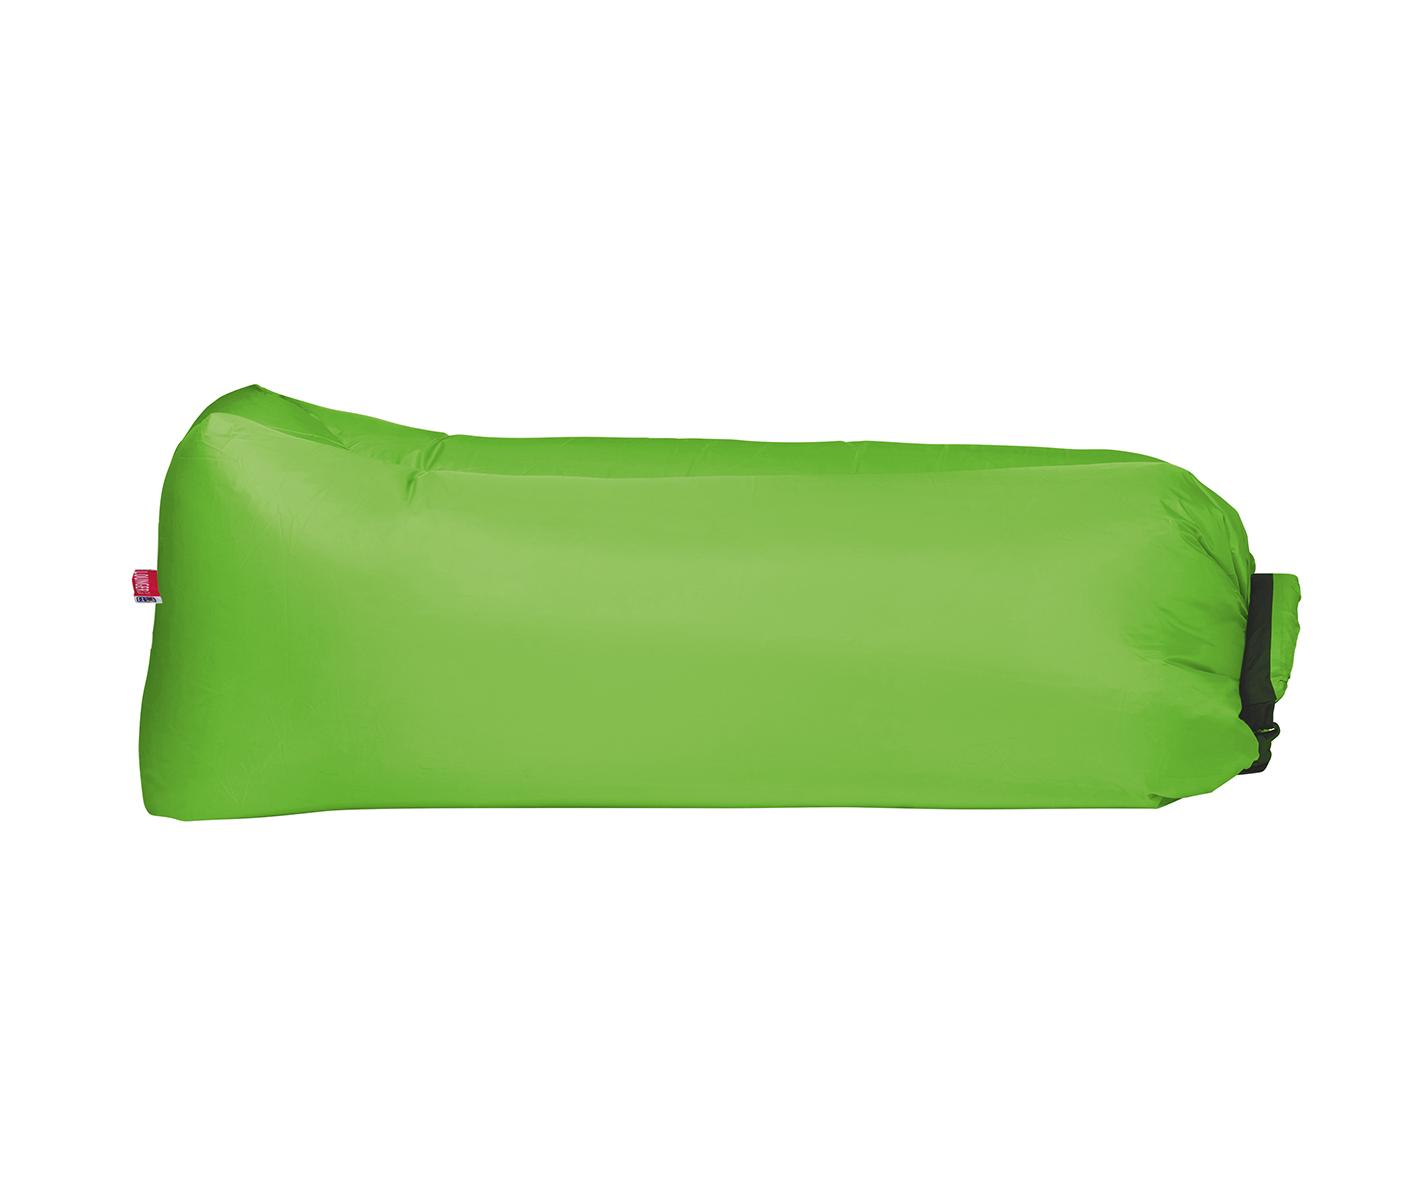 Full Size of Sitzsack Sofa Lounger To Go 20 Grn Luft Lounge Couch Sessel Luxus Erpo Online Kaufen Schilling Graues Bunt Marken Grau Leder Barock Ewald Schillig 3er Rattan Sofa Sitzsack Sofa